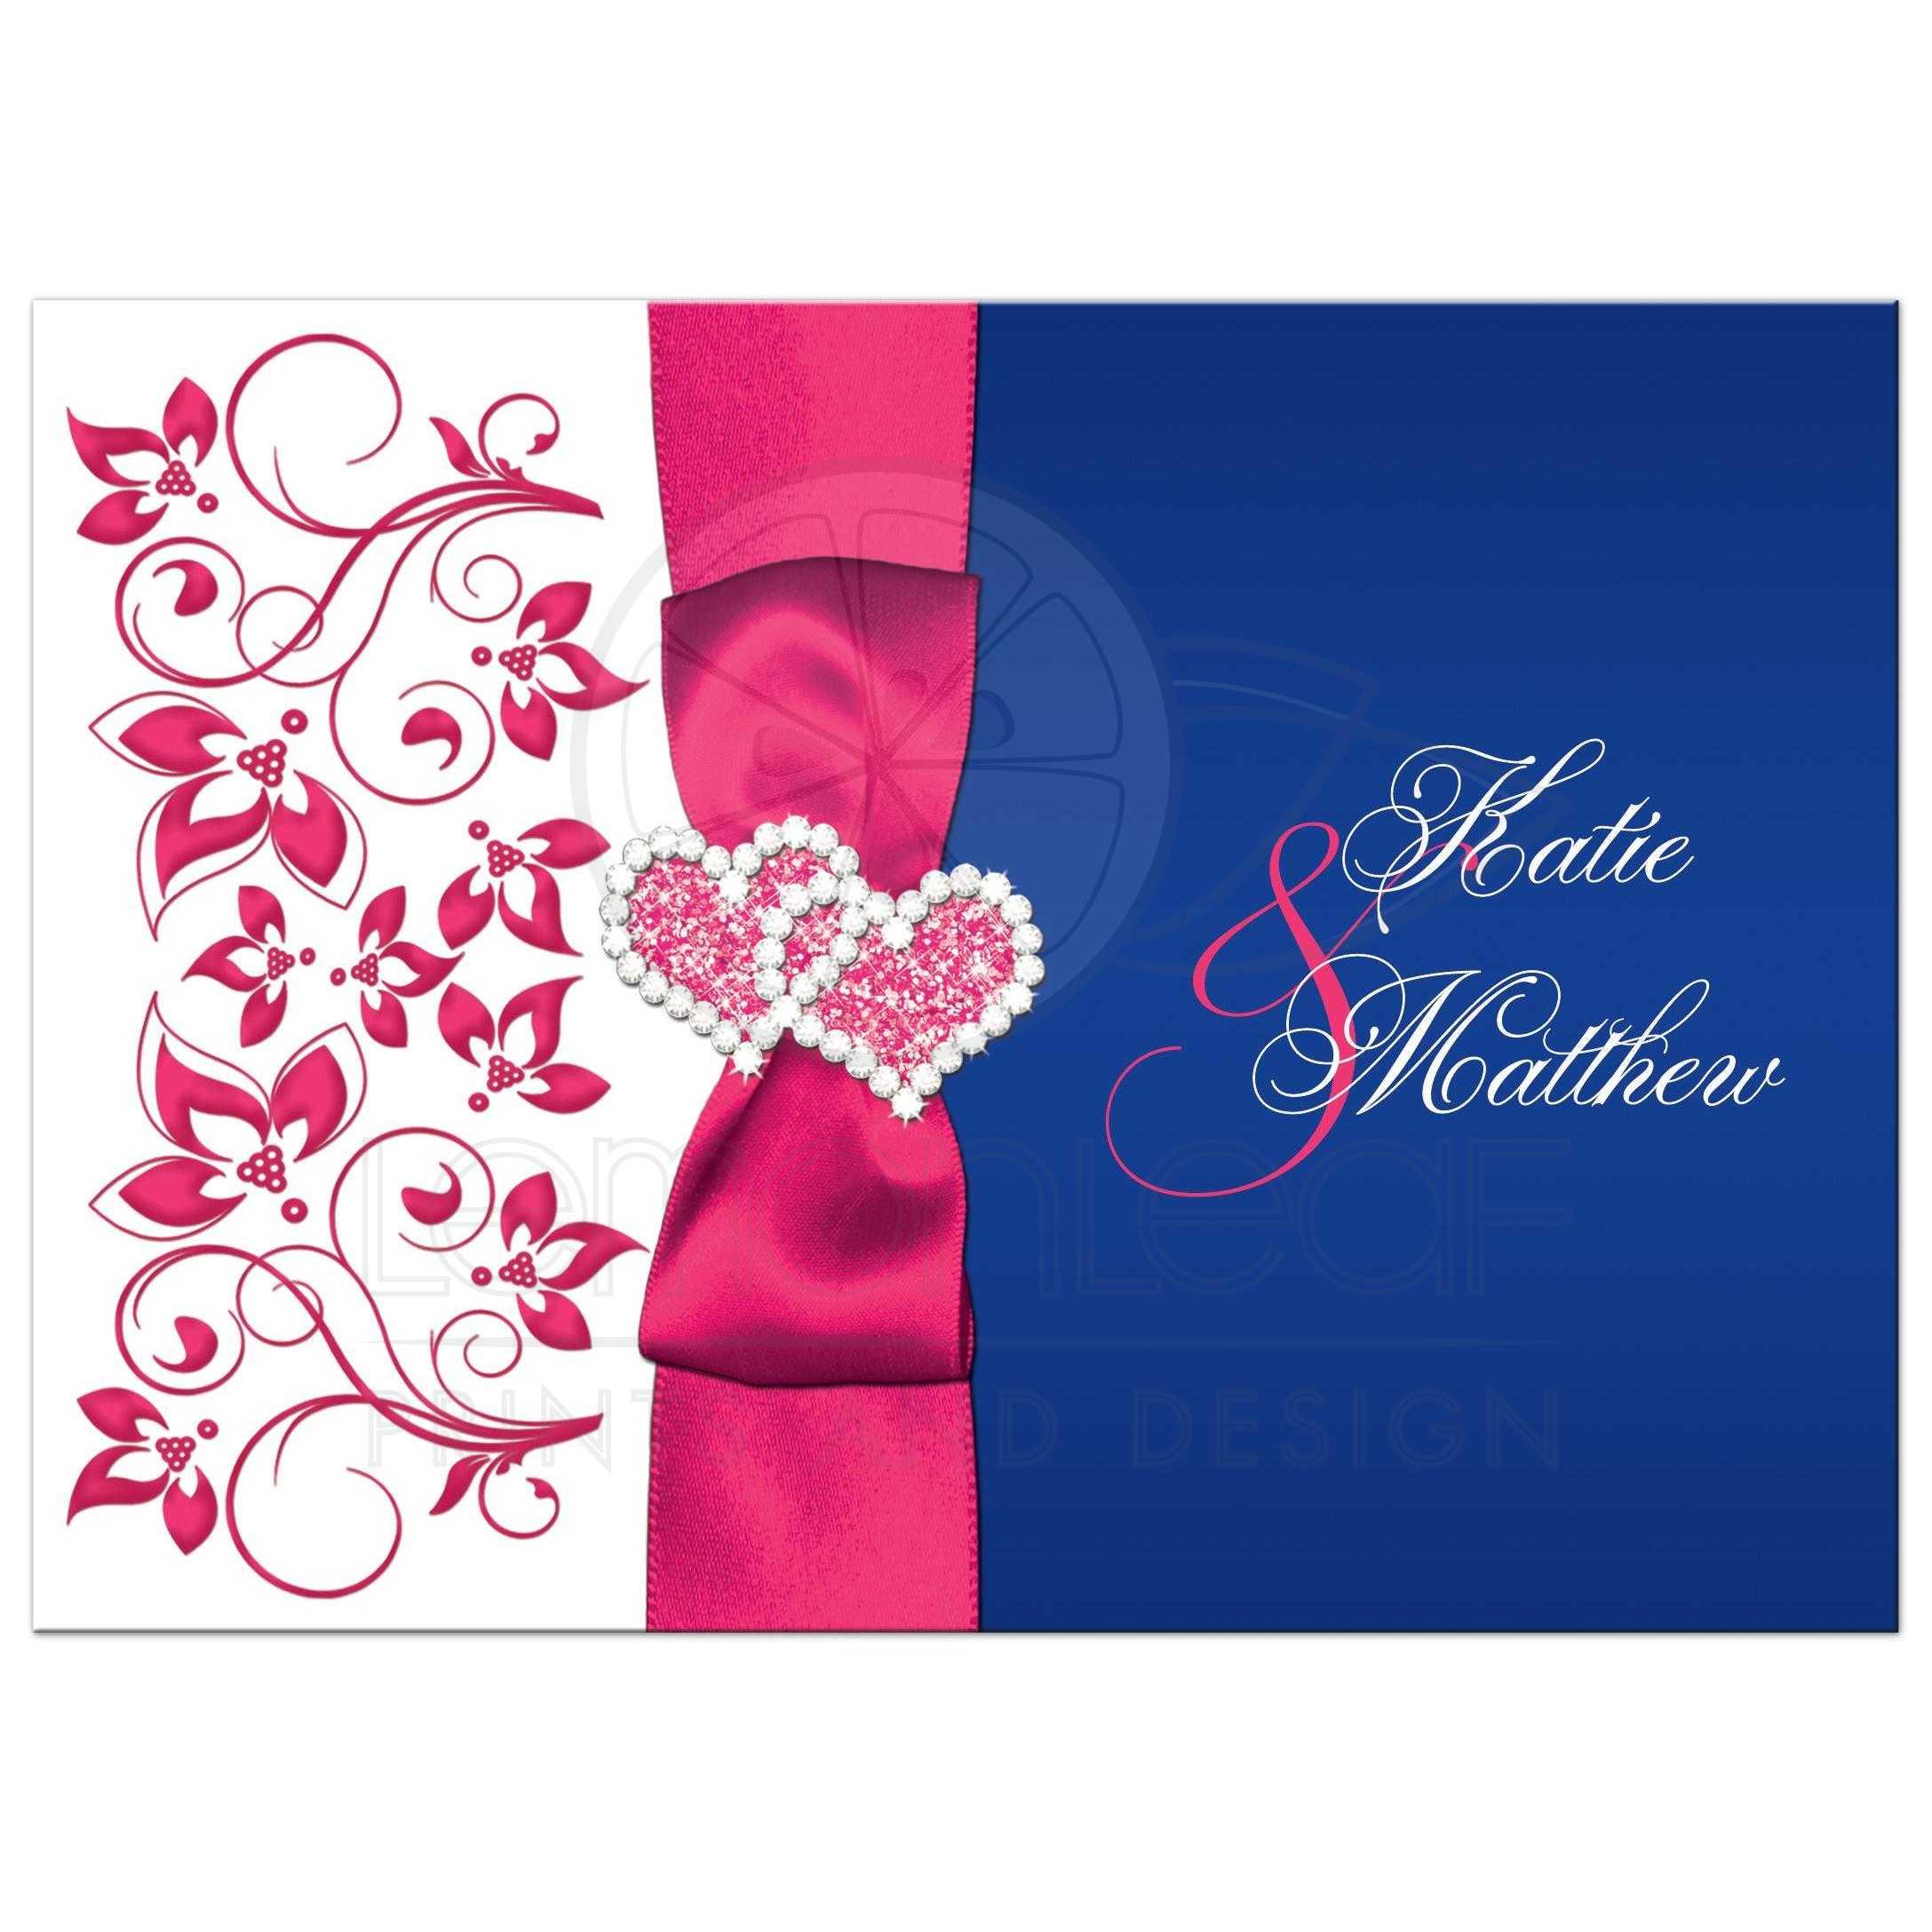 Royal Blue Fuchsia Pink And White Fl Wedding Invitation With Ribbon Bow